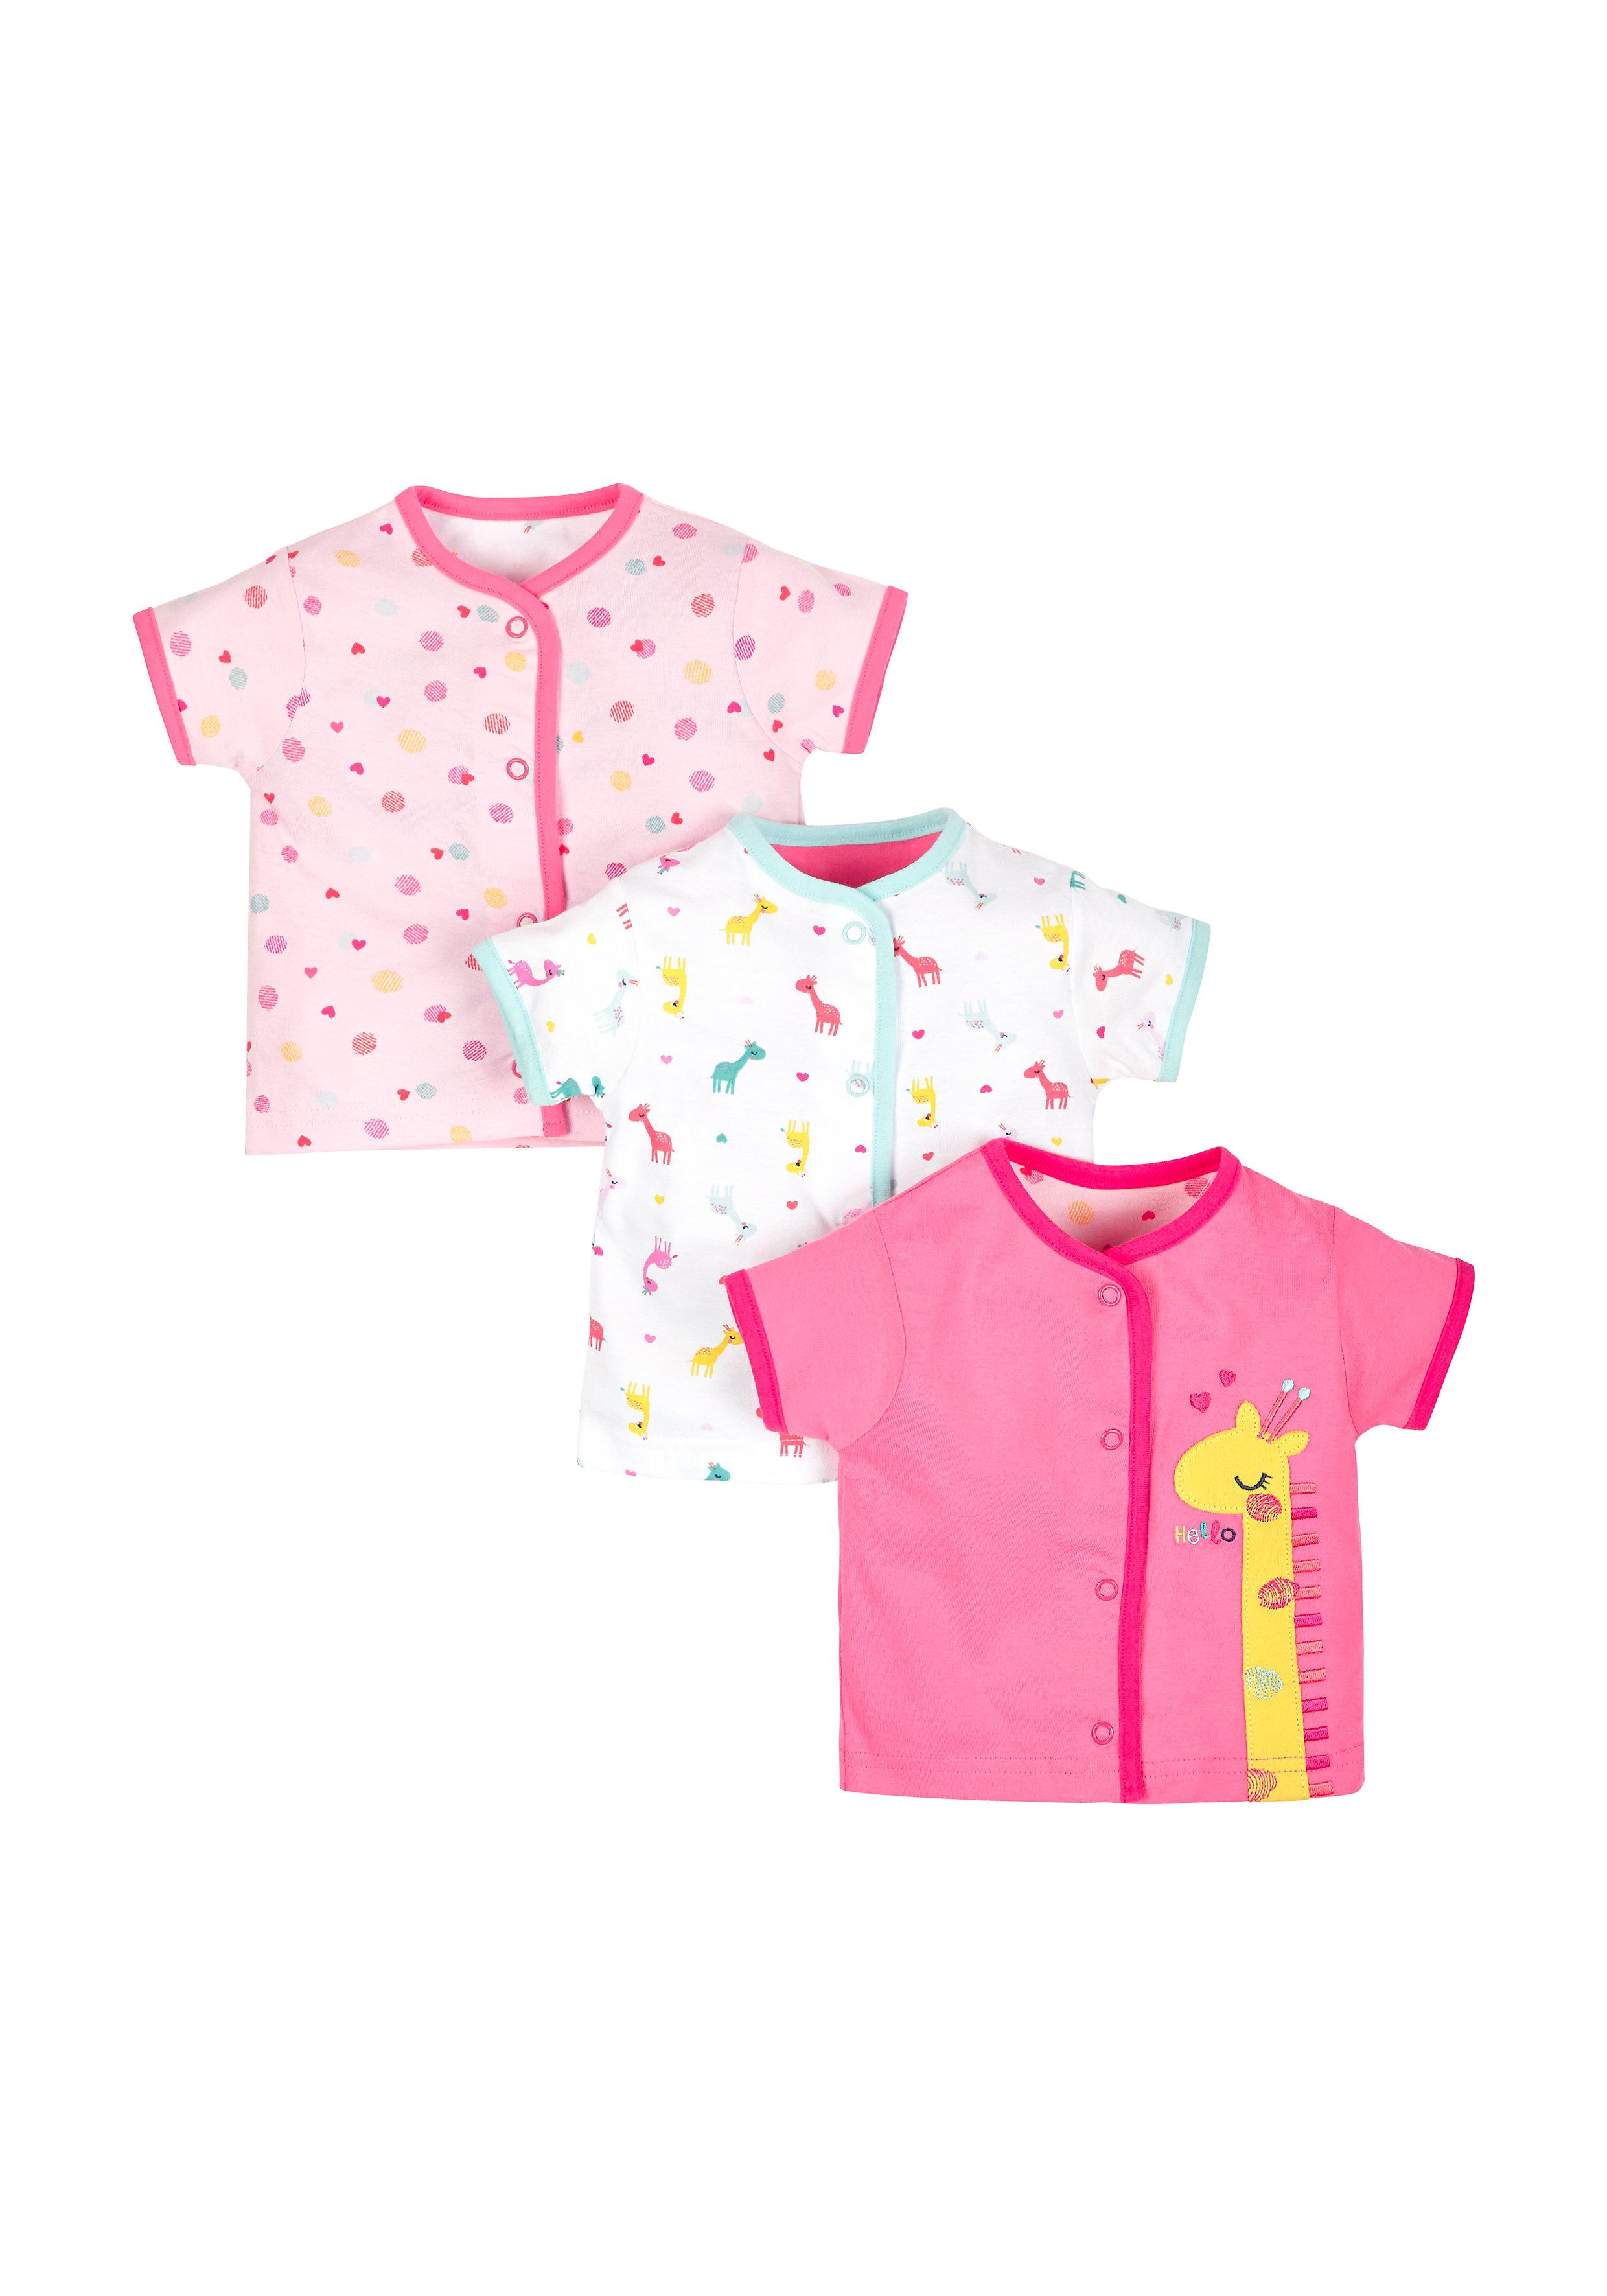 Mothercare | Girls Giraffe Tops - Pack Of 3 - Multicolor